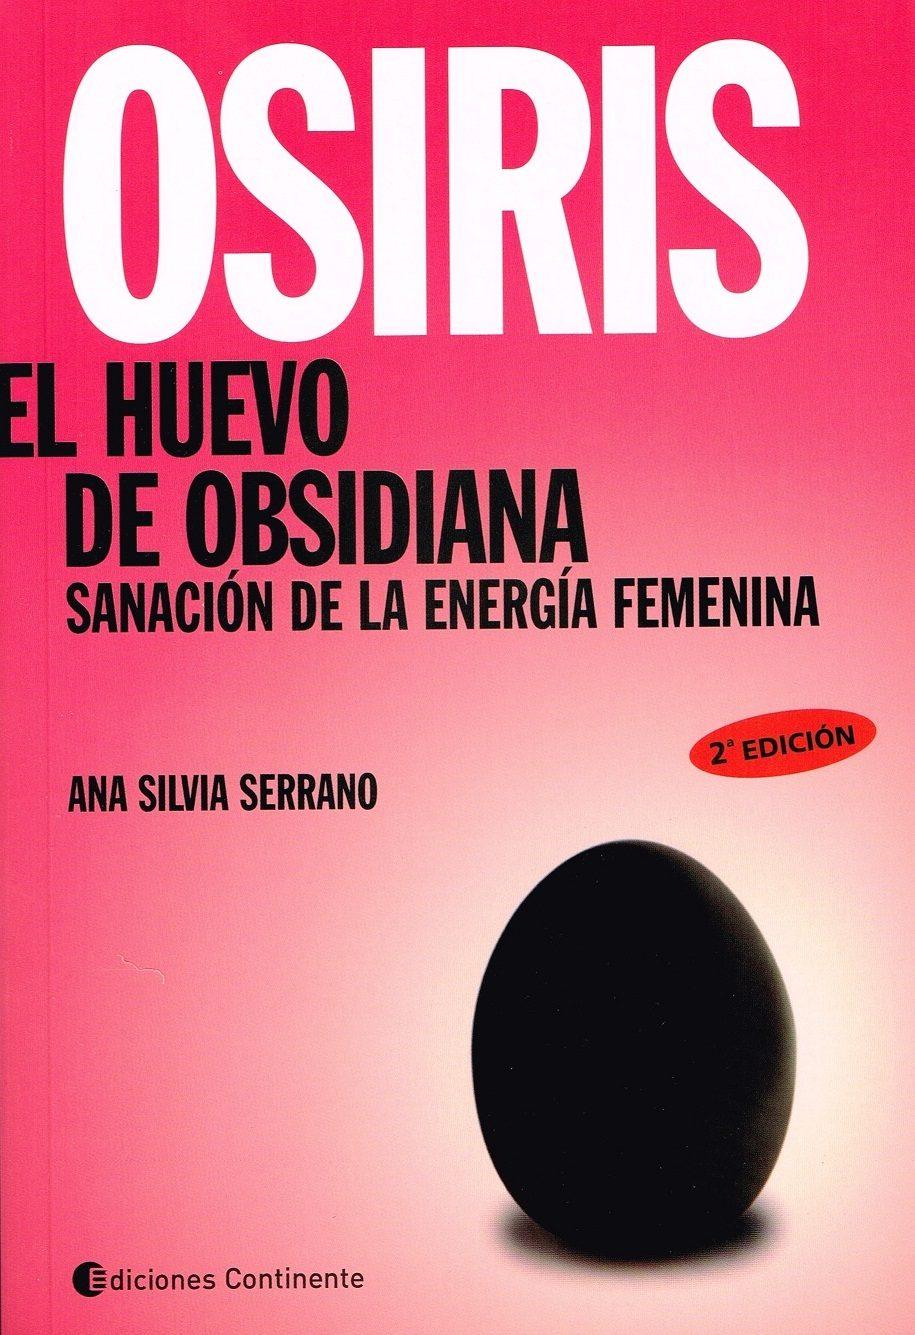 osiris el huevo de obsidiana